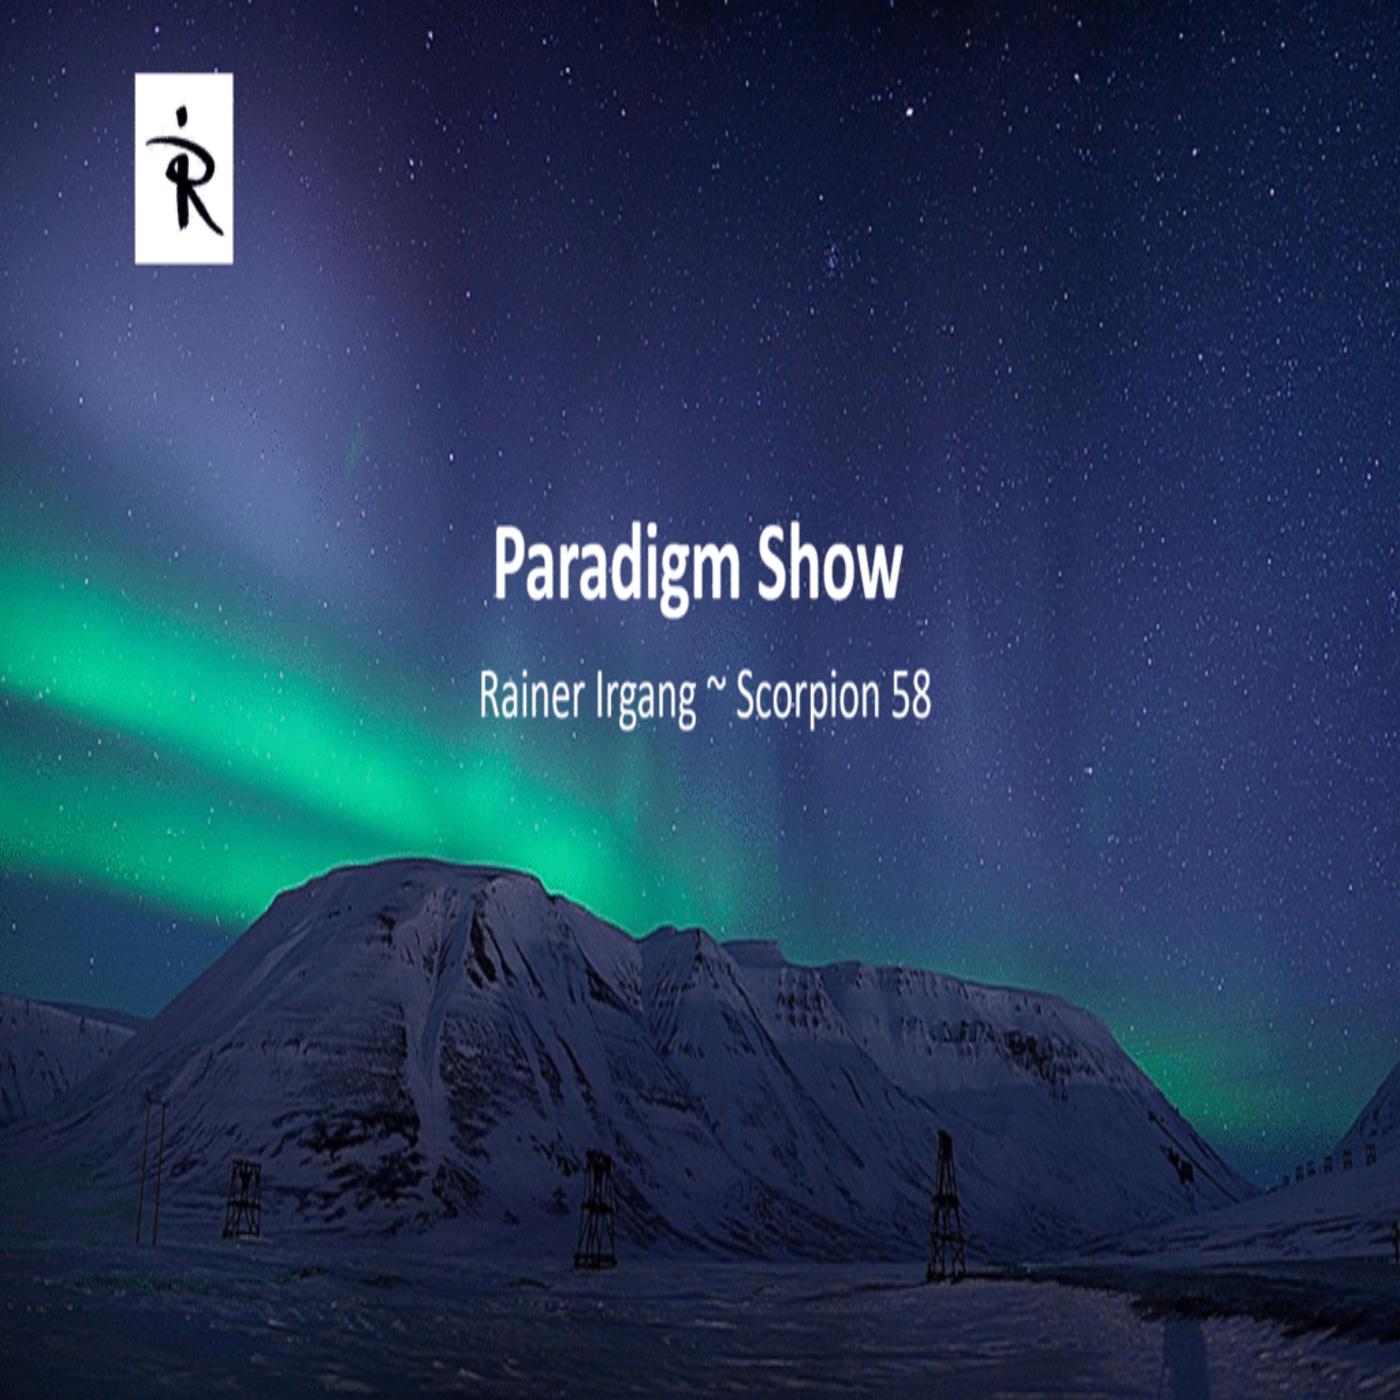 Paradigm - Show logo